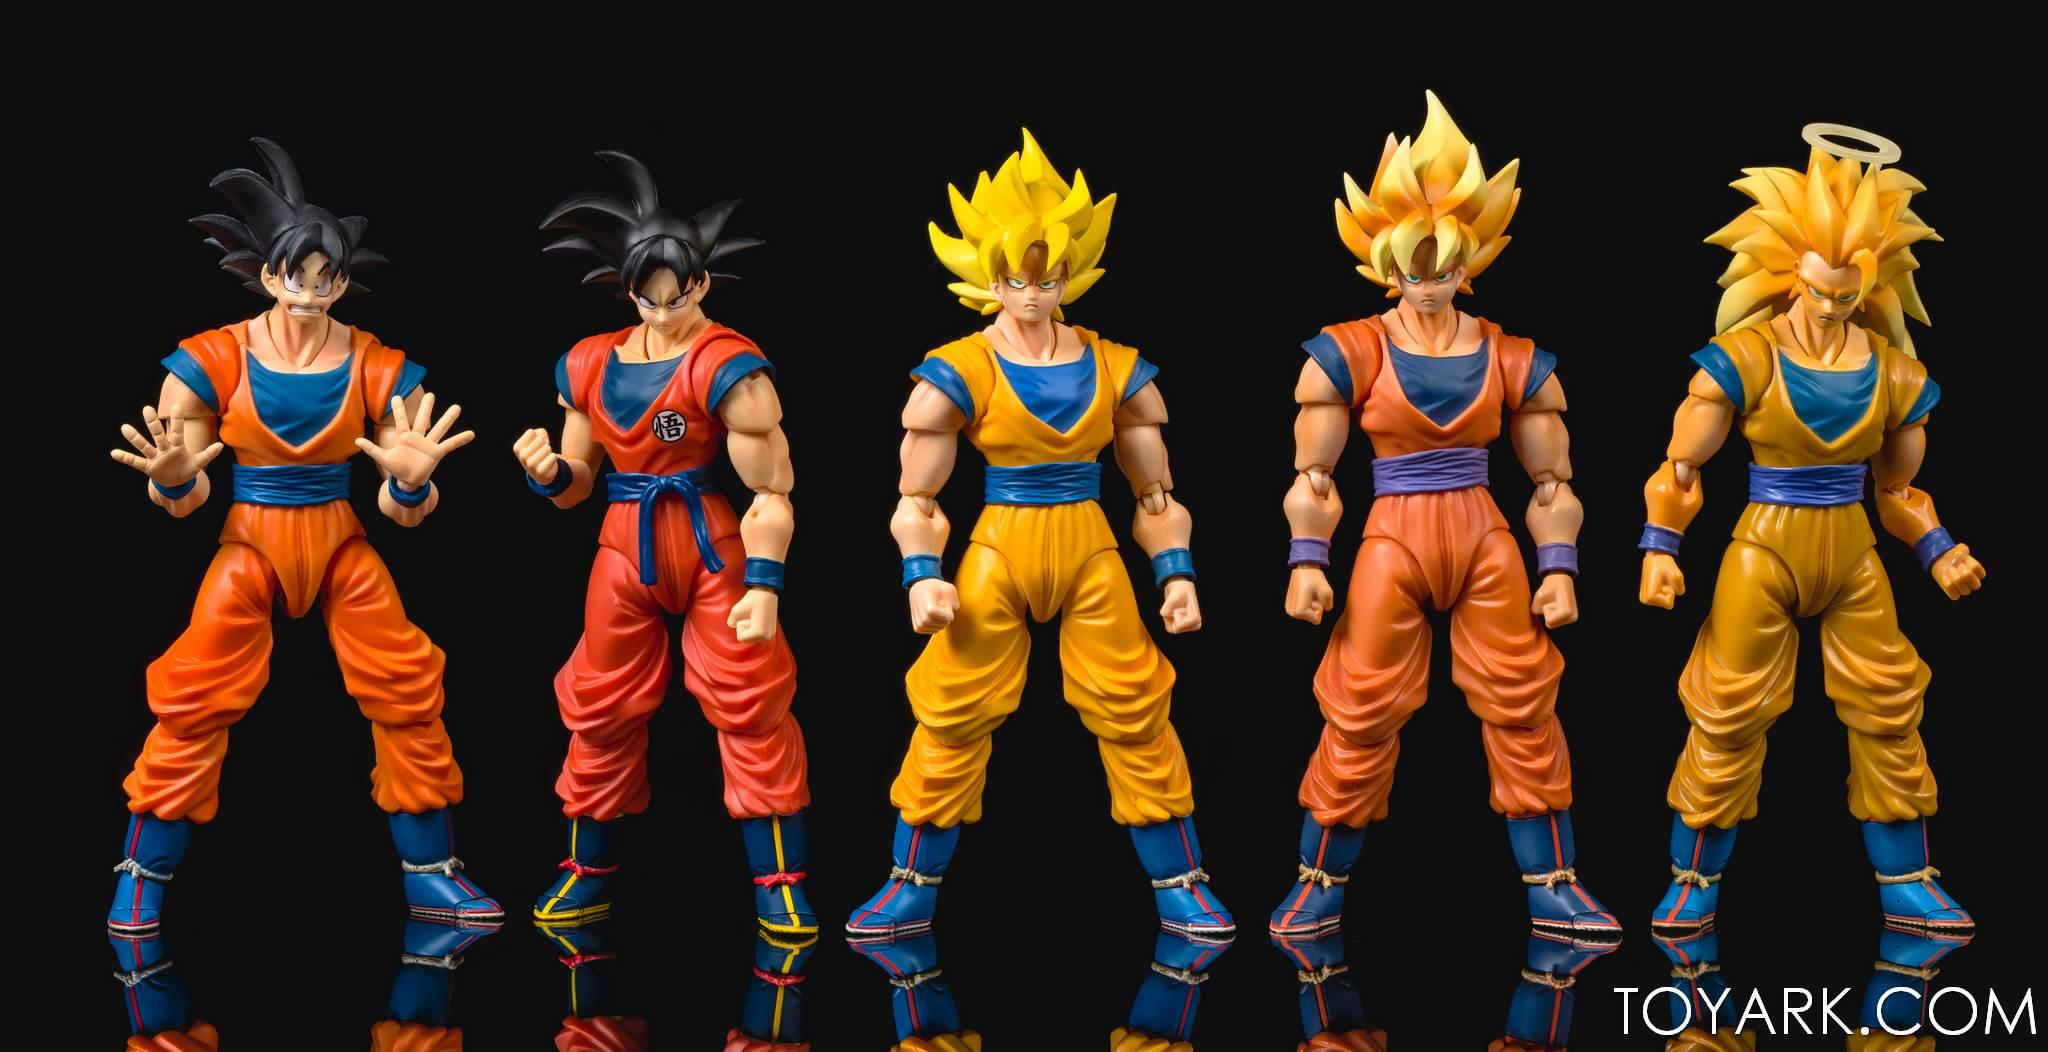 Ebay 3d Wallpaper Photo Sdcc 2015 Exclusive Son Goku Frieza Saga Version The